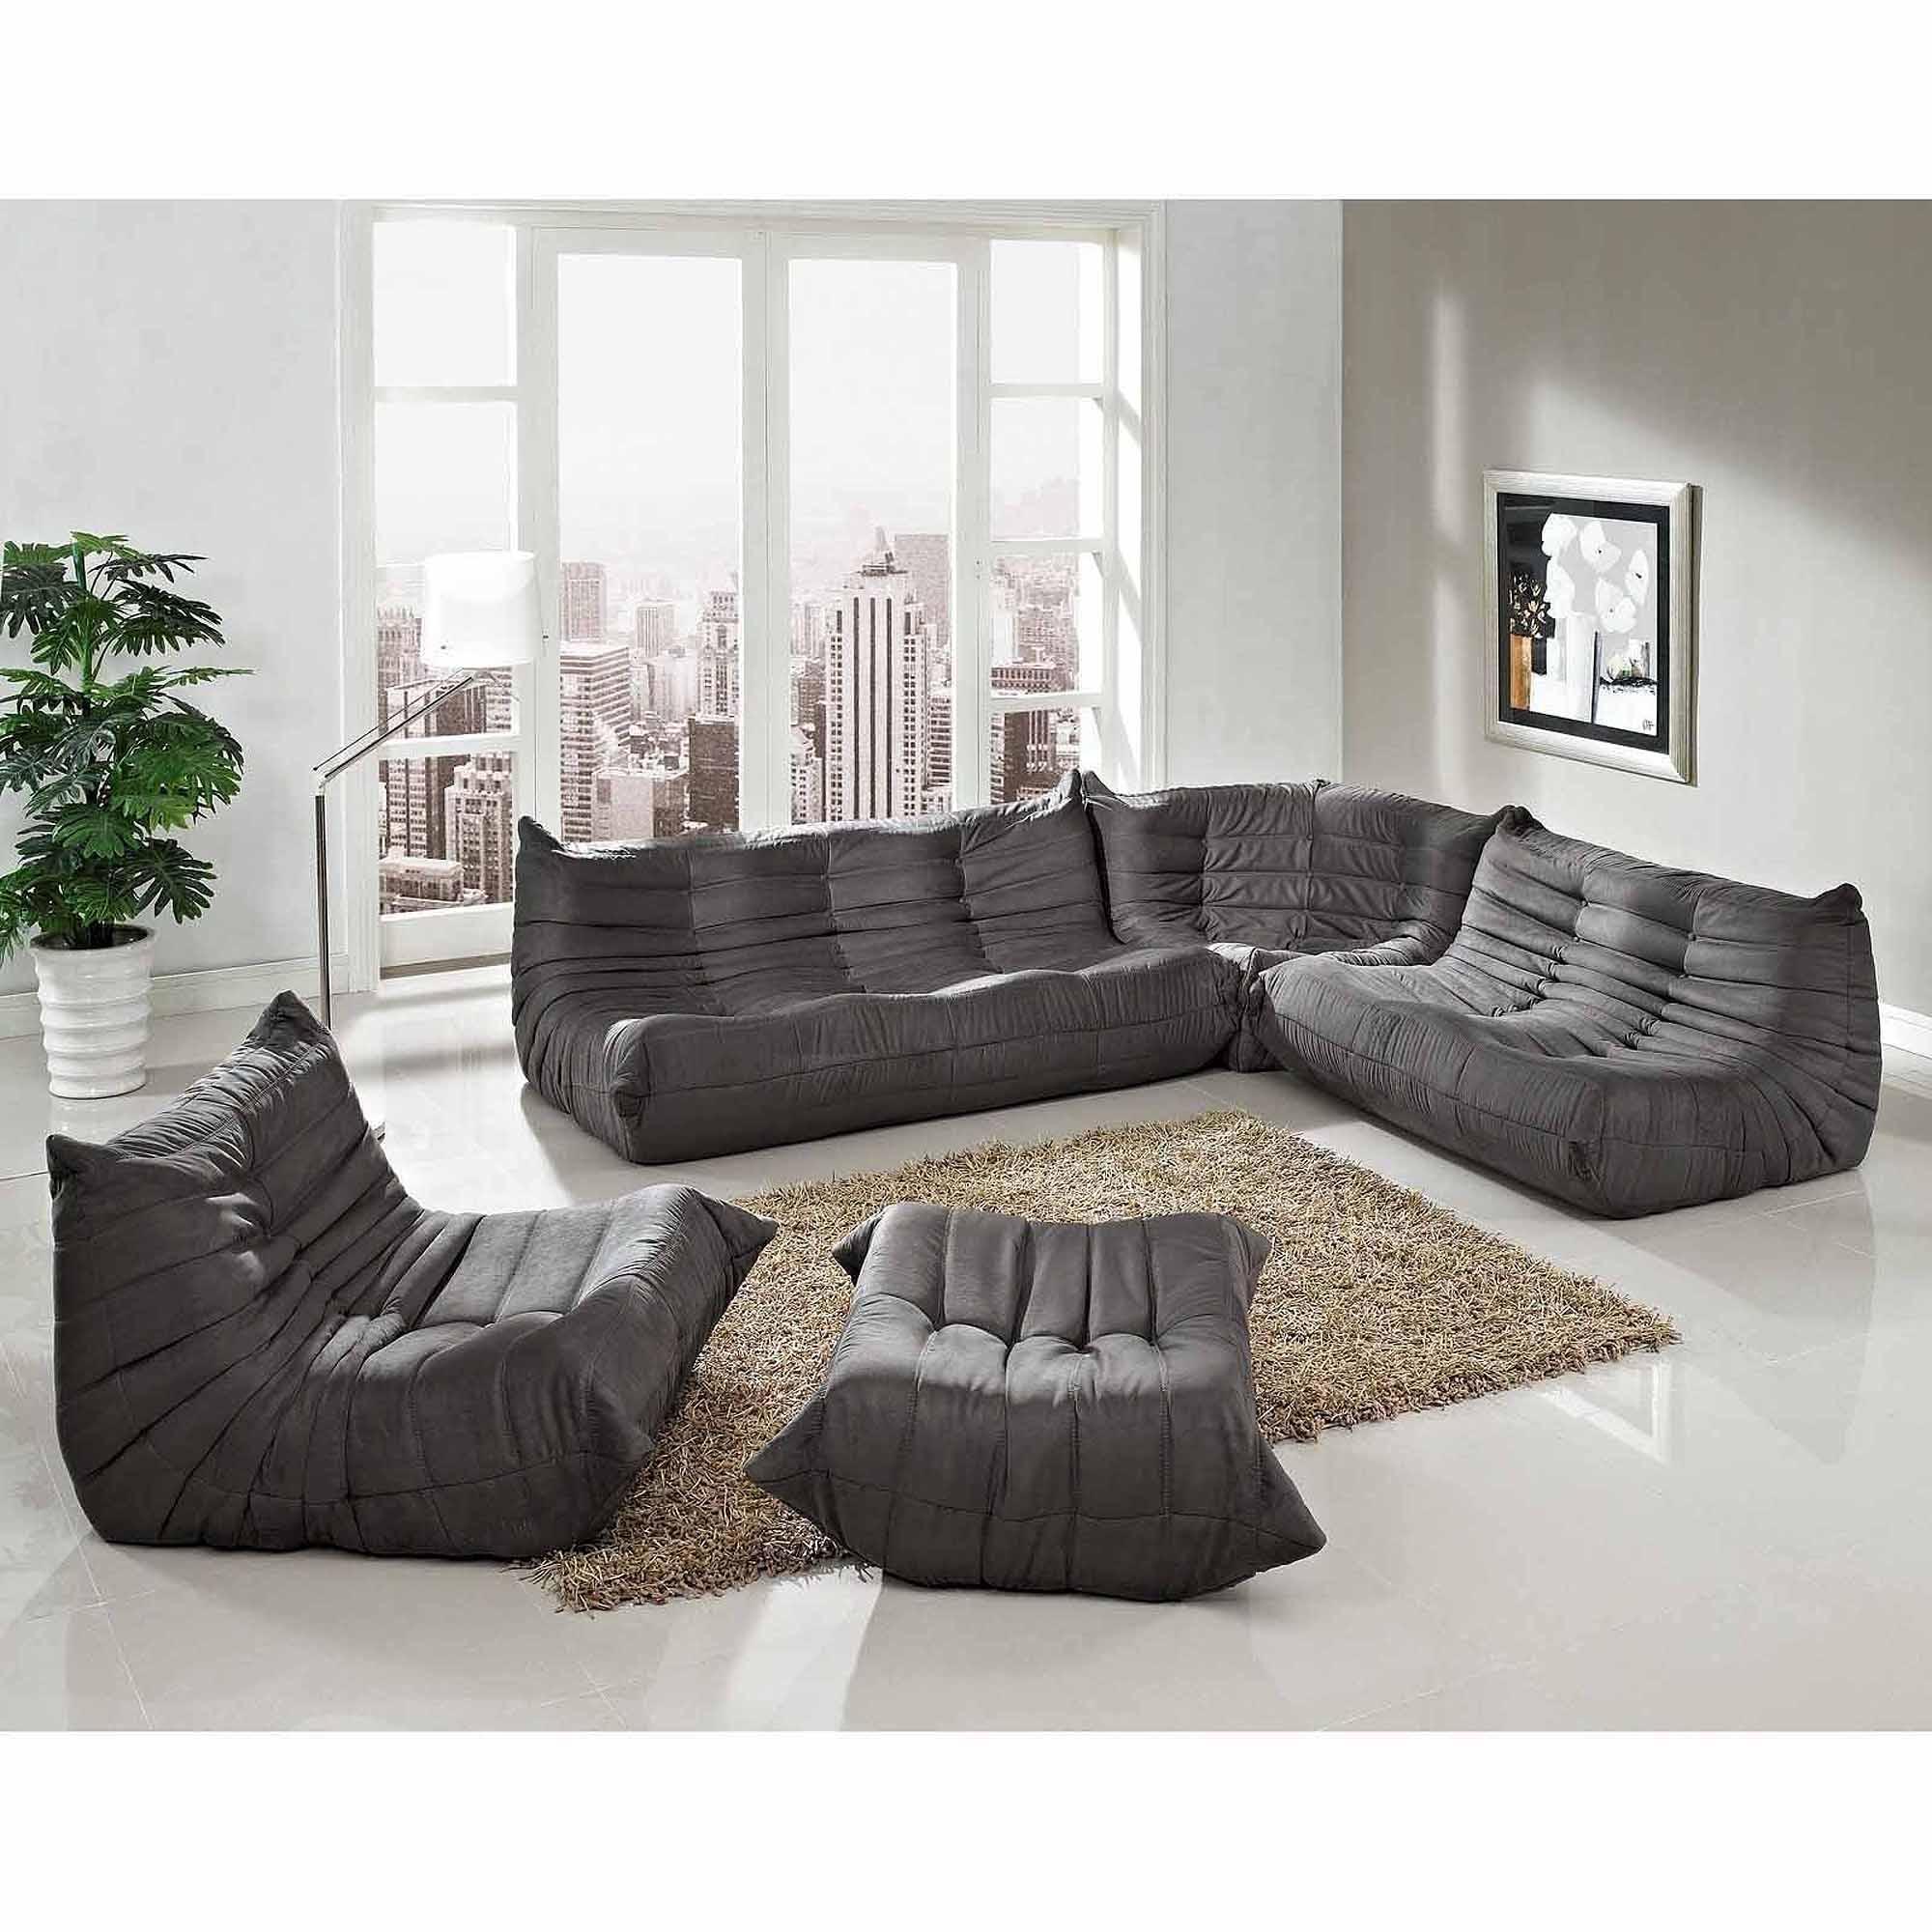 Modway Waverunner Modular Sectional Sofa Set (5 Piece) – Walmart Inside Small Modular Sectional Sofa (Image 13 of 20)